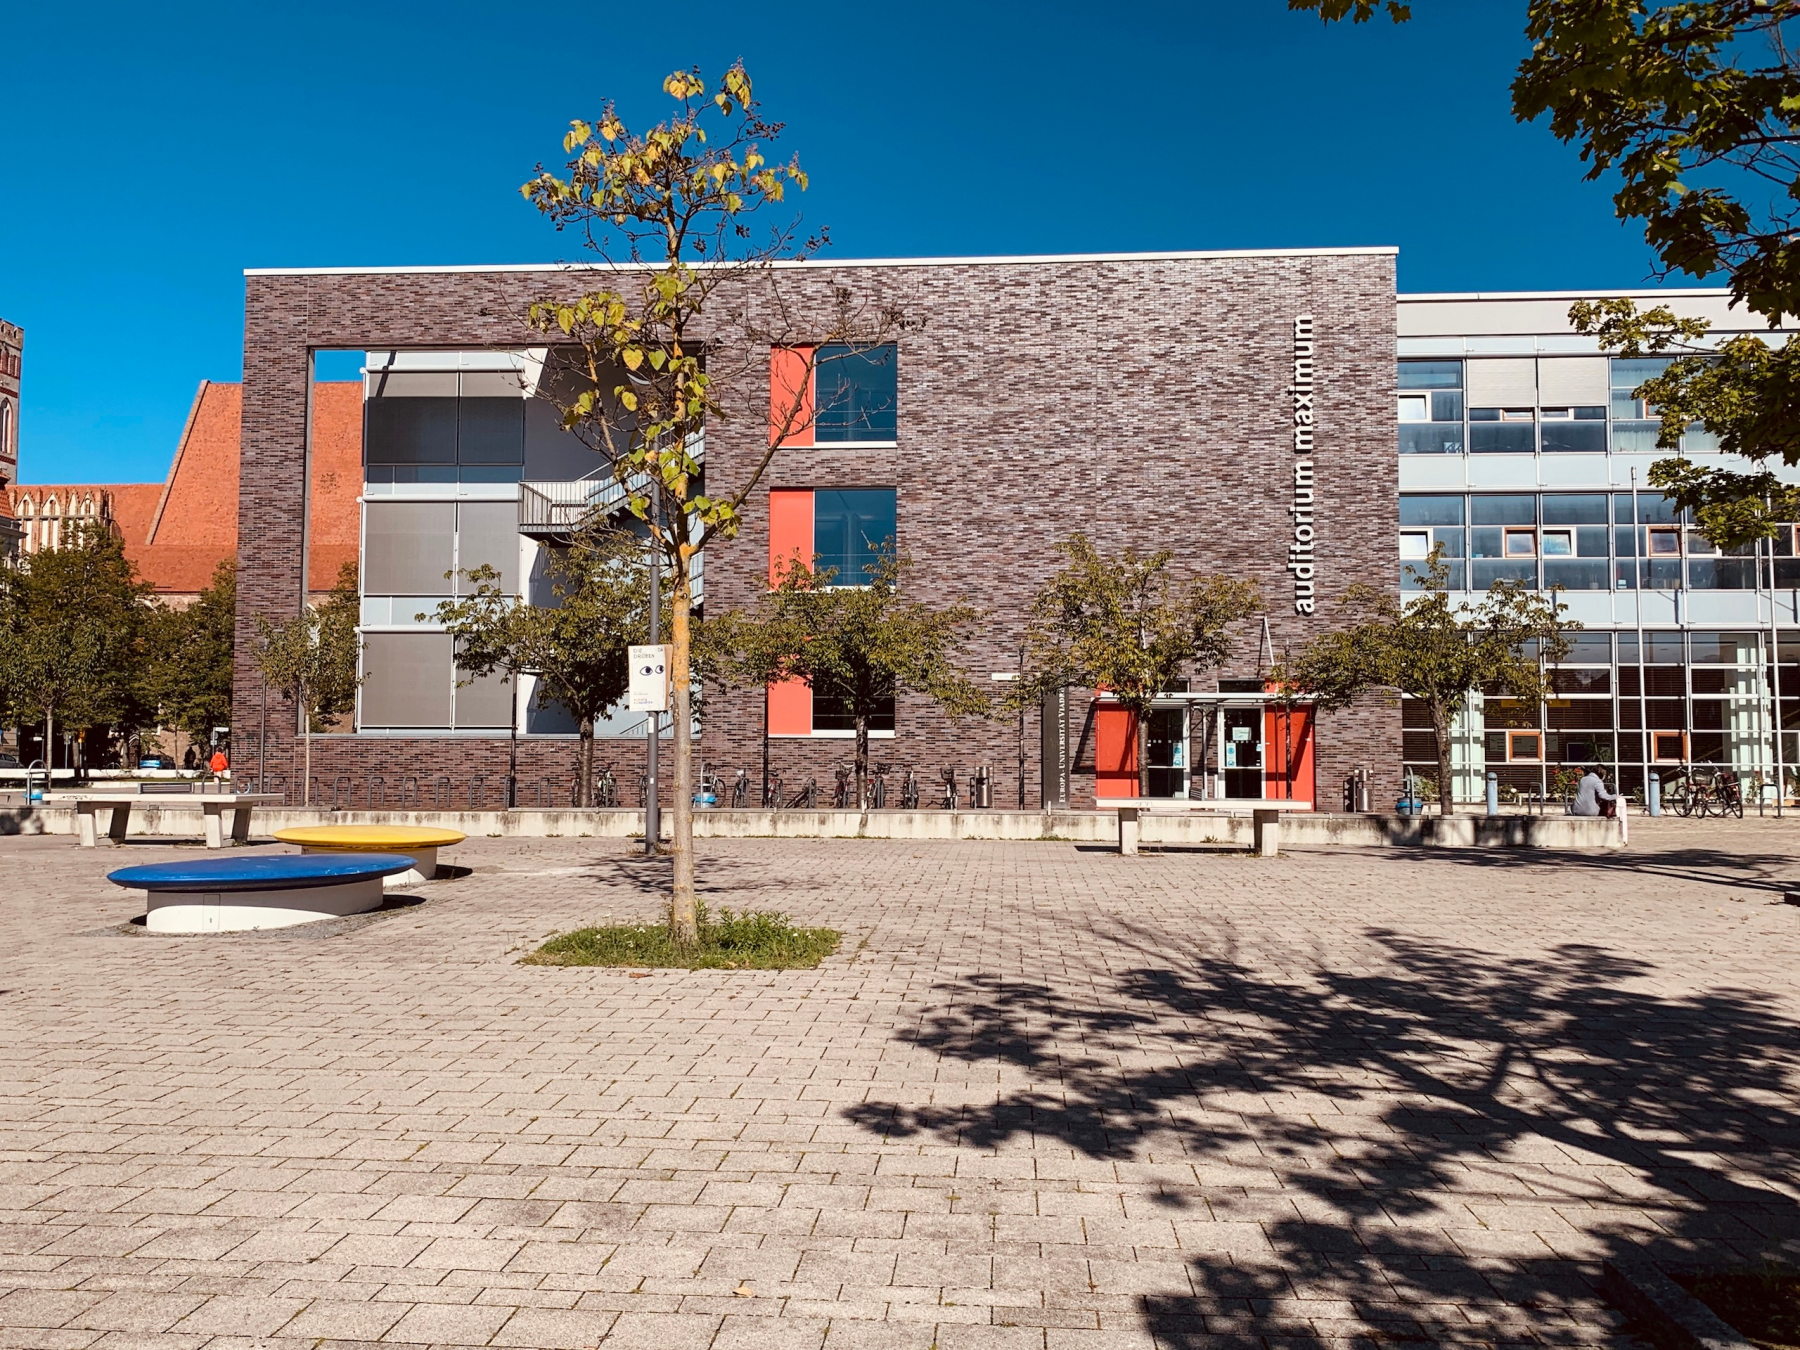 Europa-Universität Viadrina Frankfurt (Oder)